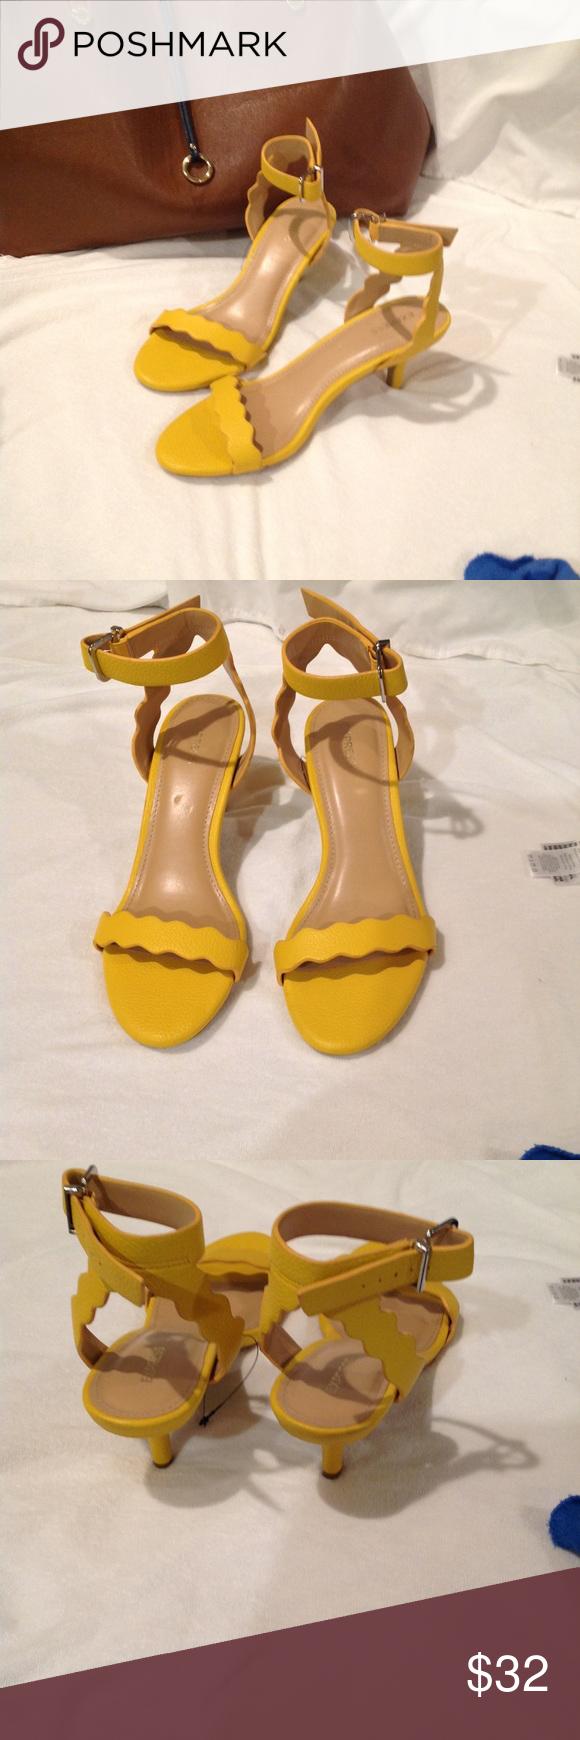 Express Yellow Round Toe Heeled Sandal Size 9 Sandals Heels Kitten Heel Sandals Round Toe Heels